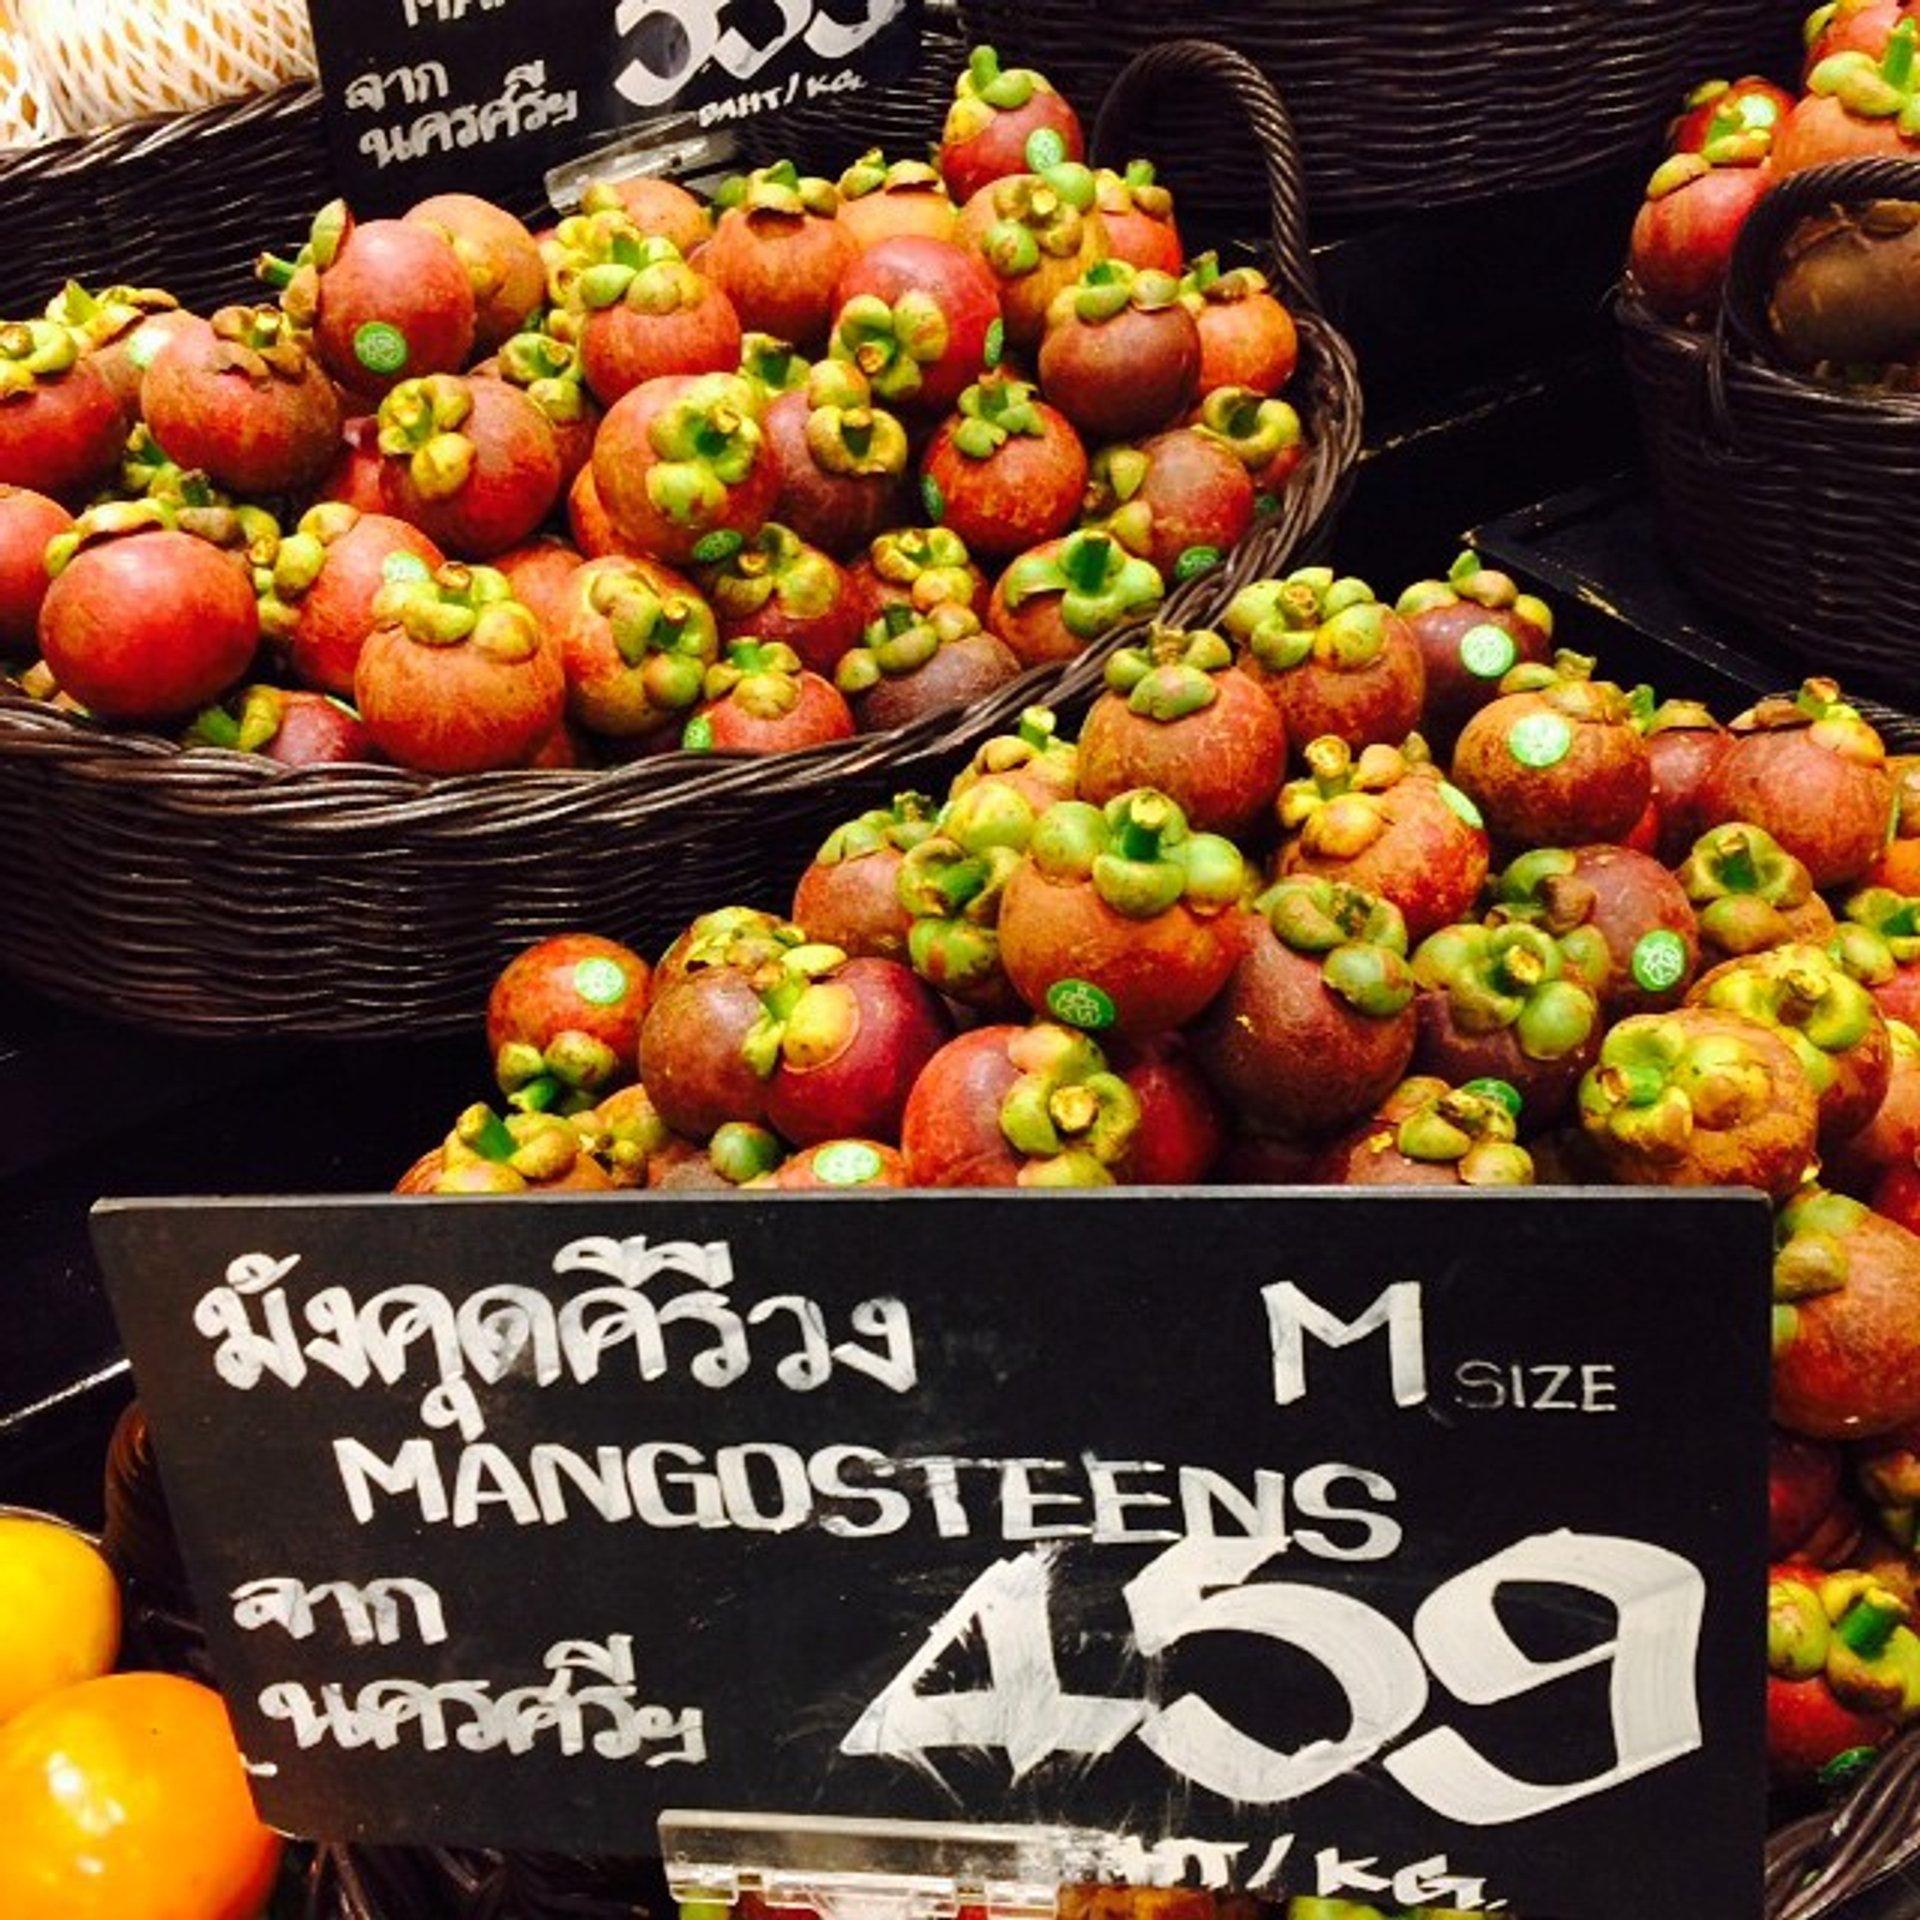 Mangosteen Season in Thailand - Best Season 2020